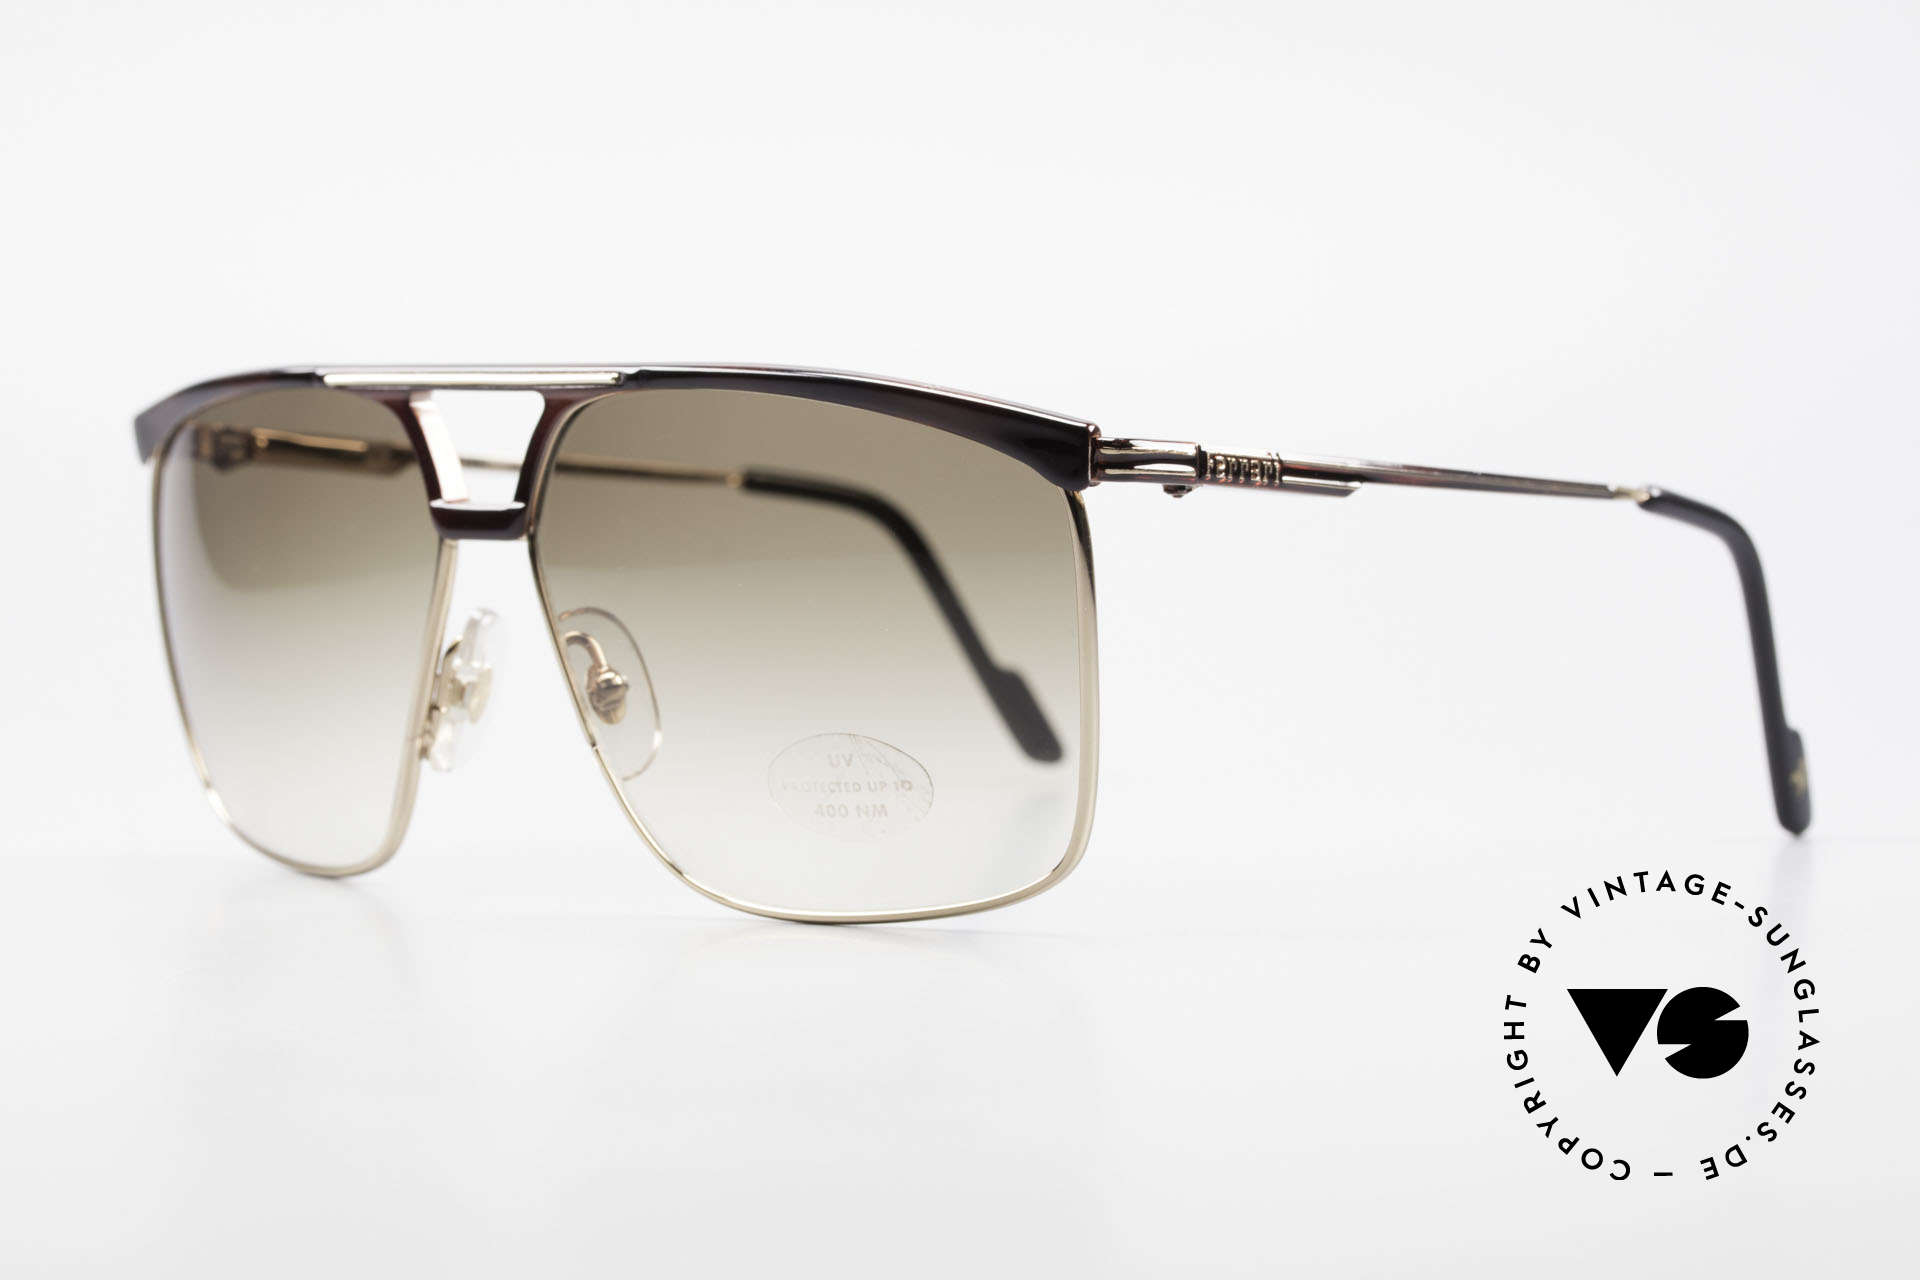 Ferrari F35 Alutanium Sunglasses X-Large, high-end Alutanium frame with flexible spring hinges, Made for Men